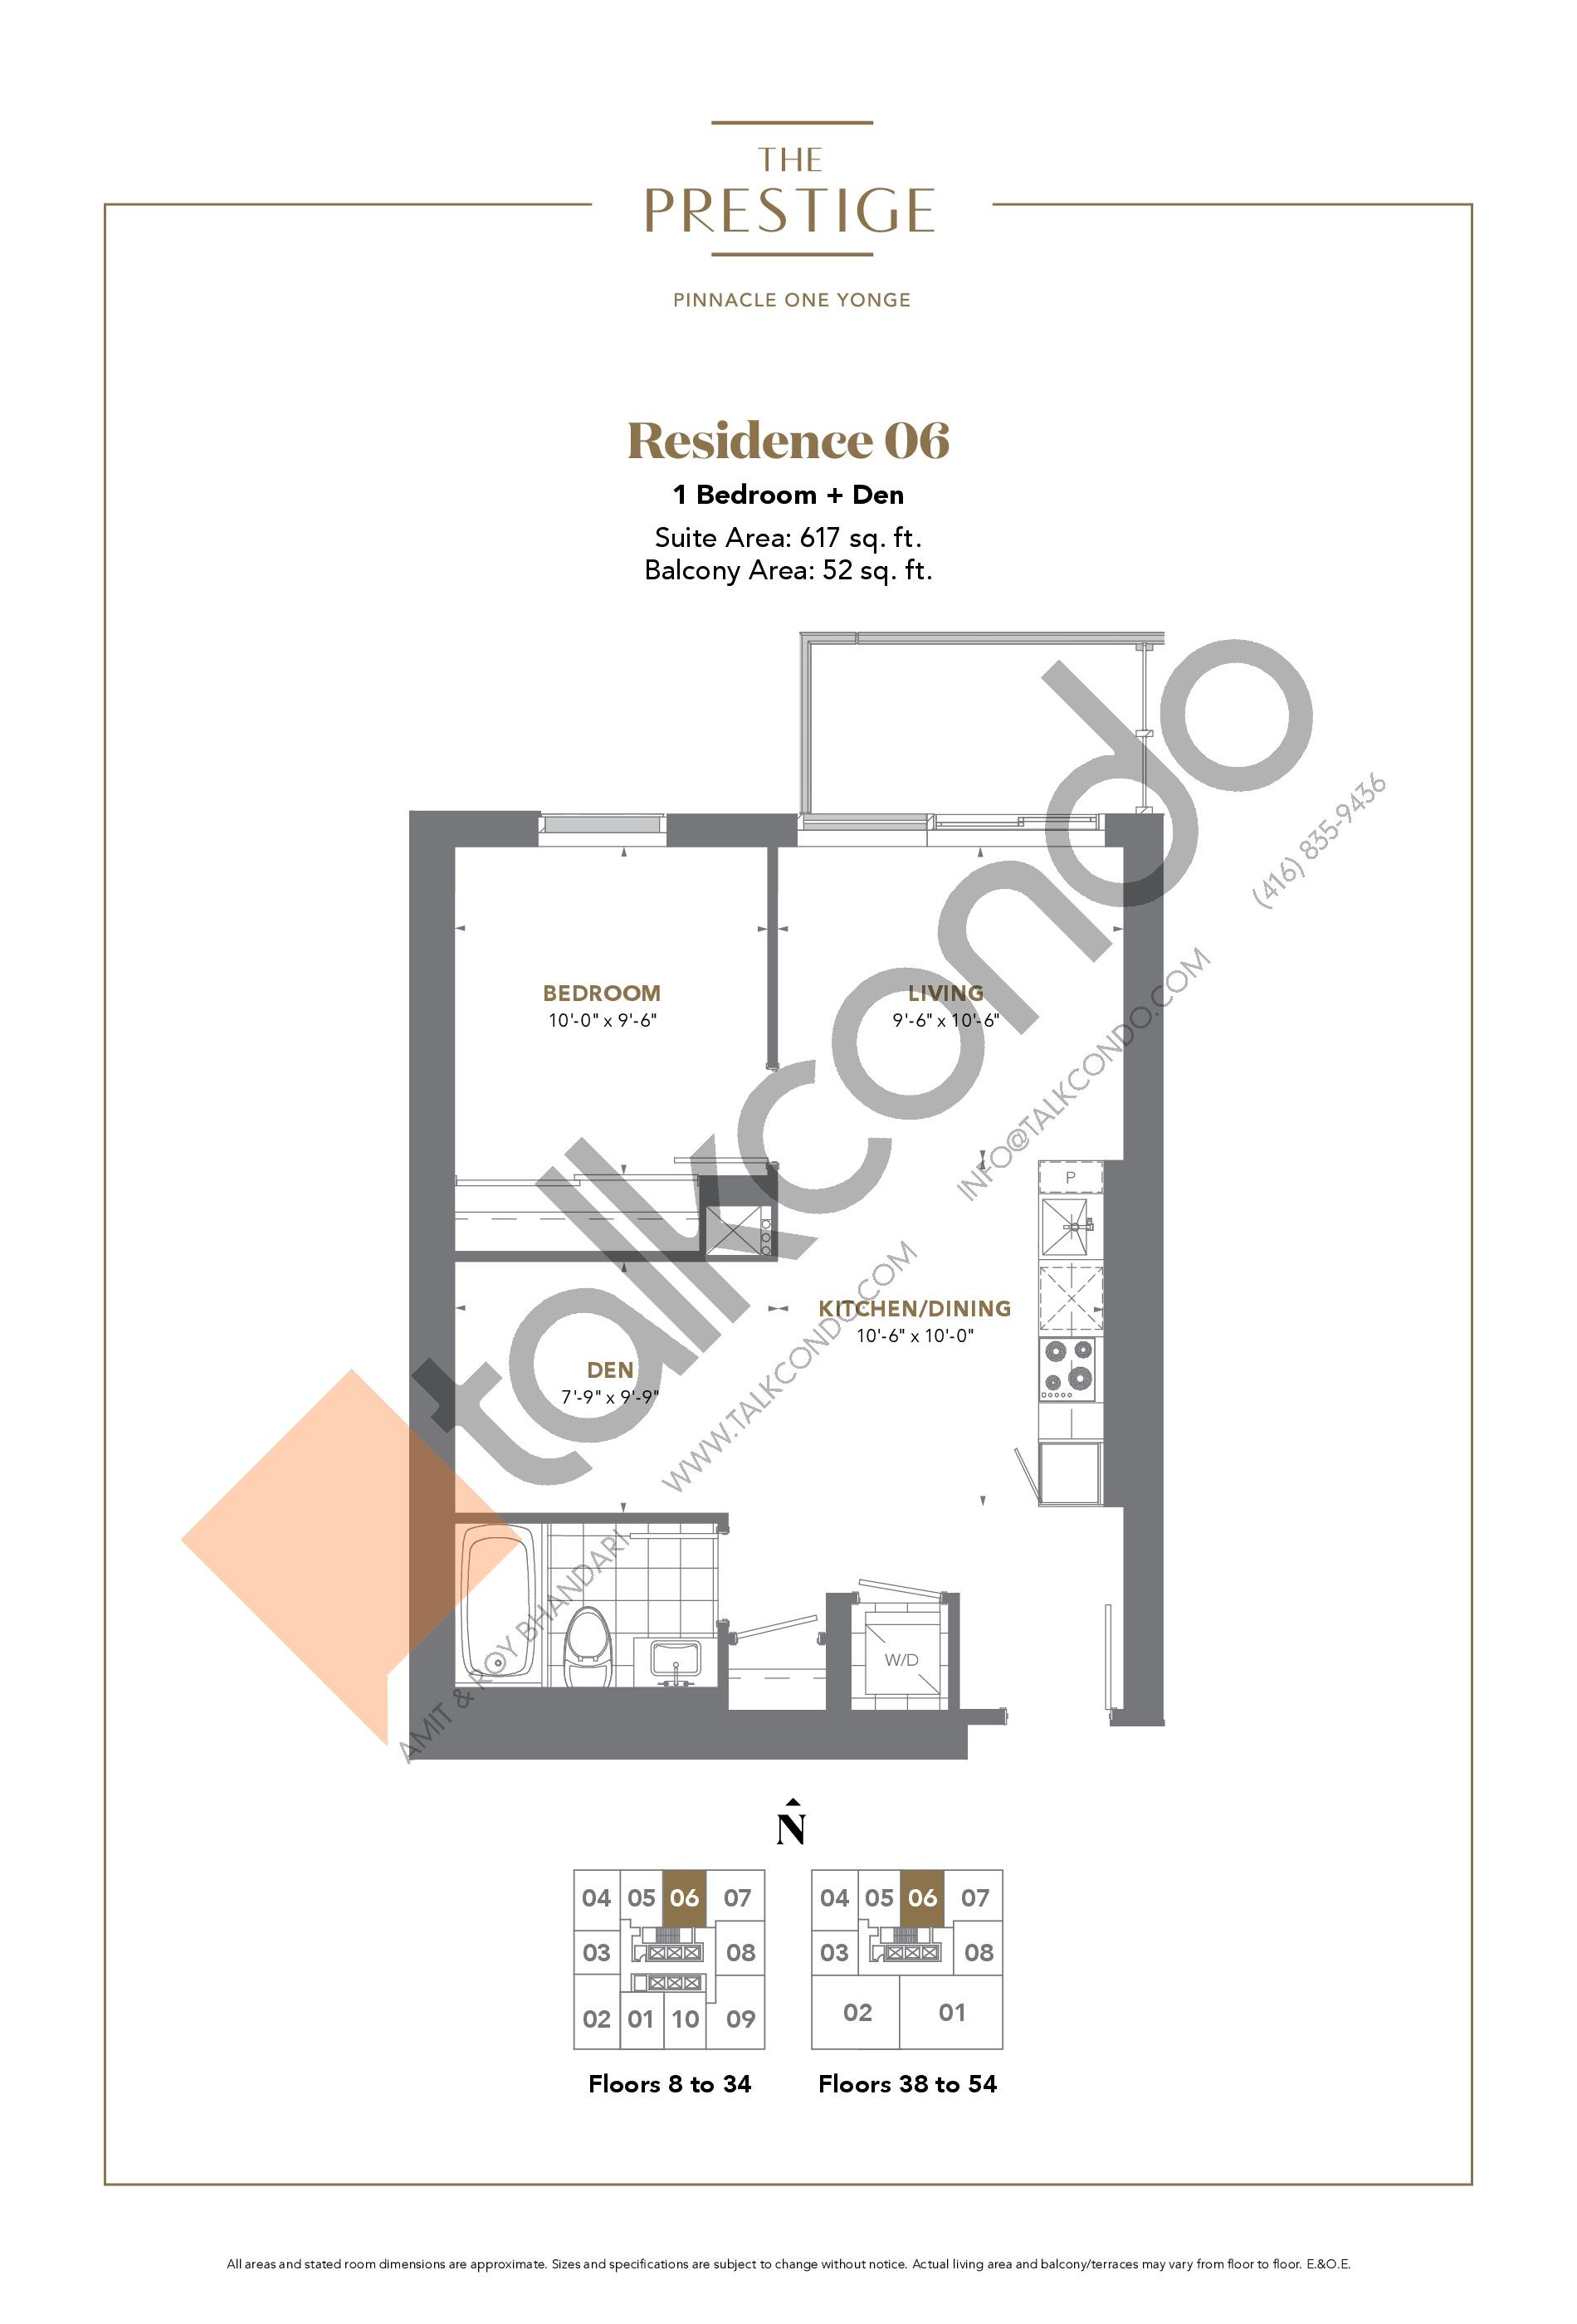 Residence 06 Floor Plan at The Prestige Condos at Pinnacle One Yonge - 617 sq.ft